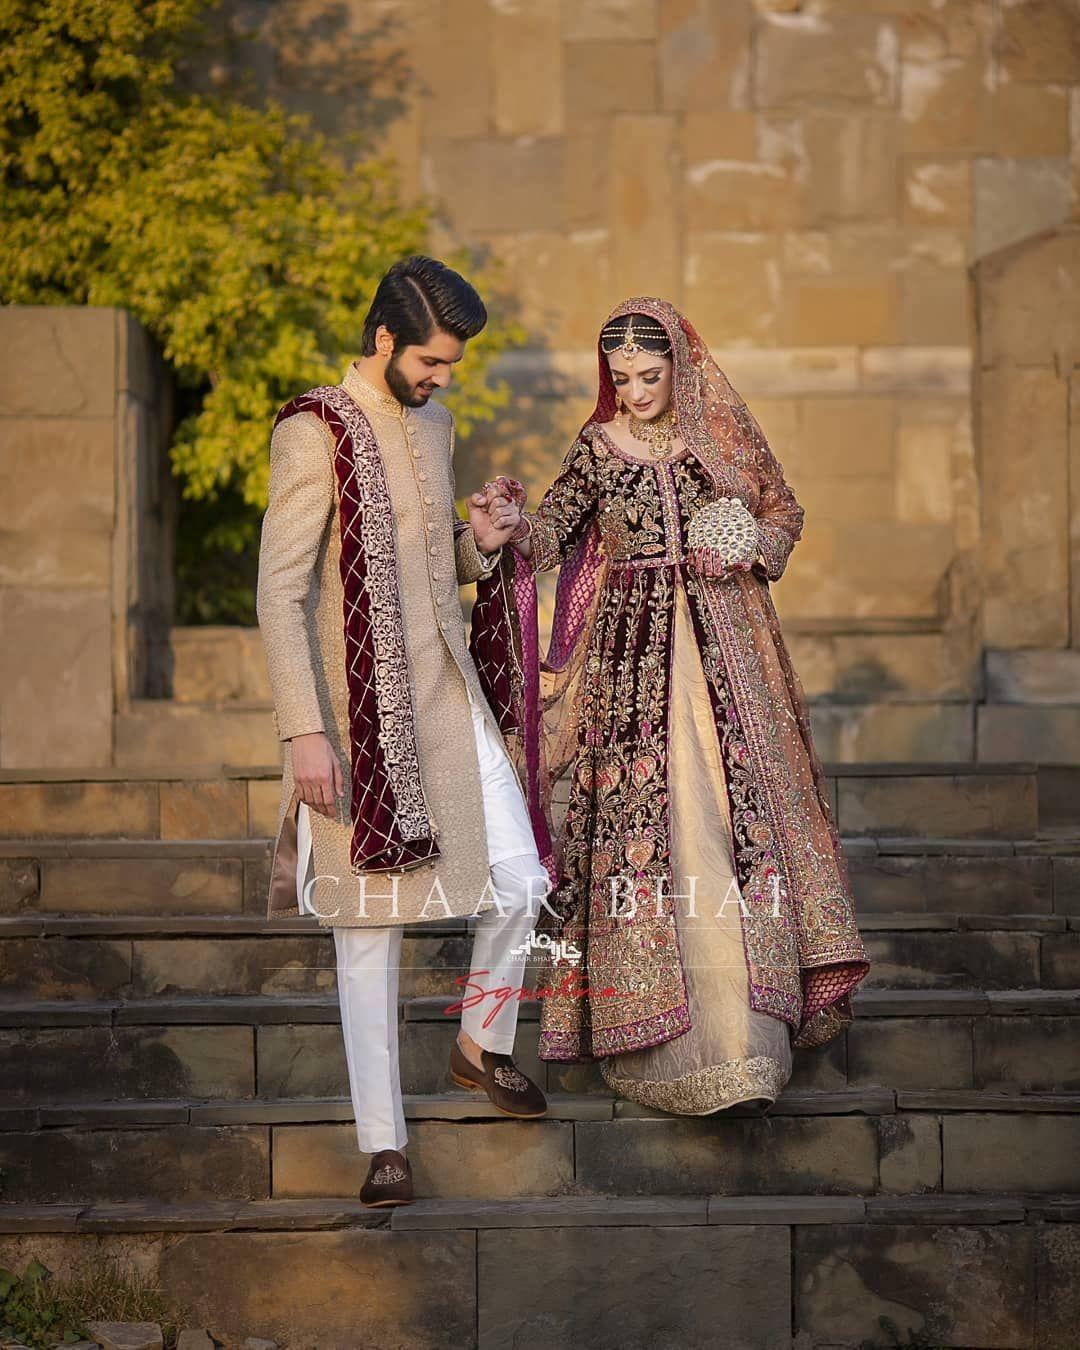 Awesome Wedding Photos Of Singer Abdullah Qureshi Daily Infotech Couple Wedding Dress Asian Wedding Dress Pakistani Bridal Dress Fashion